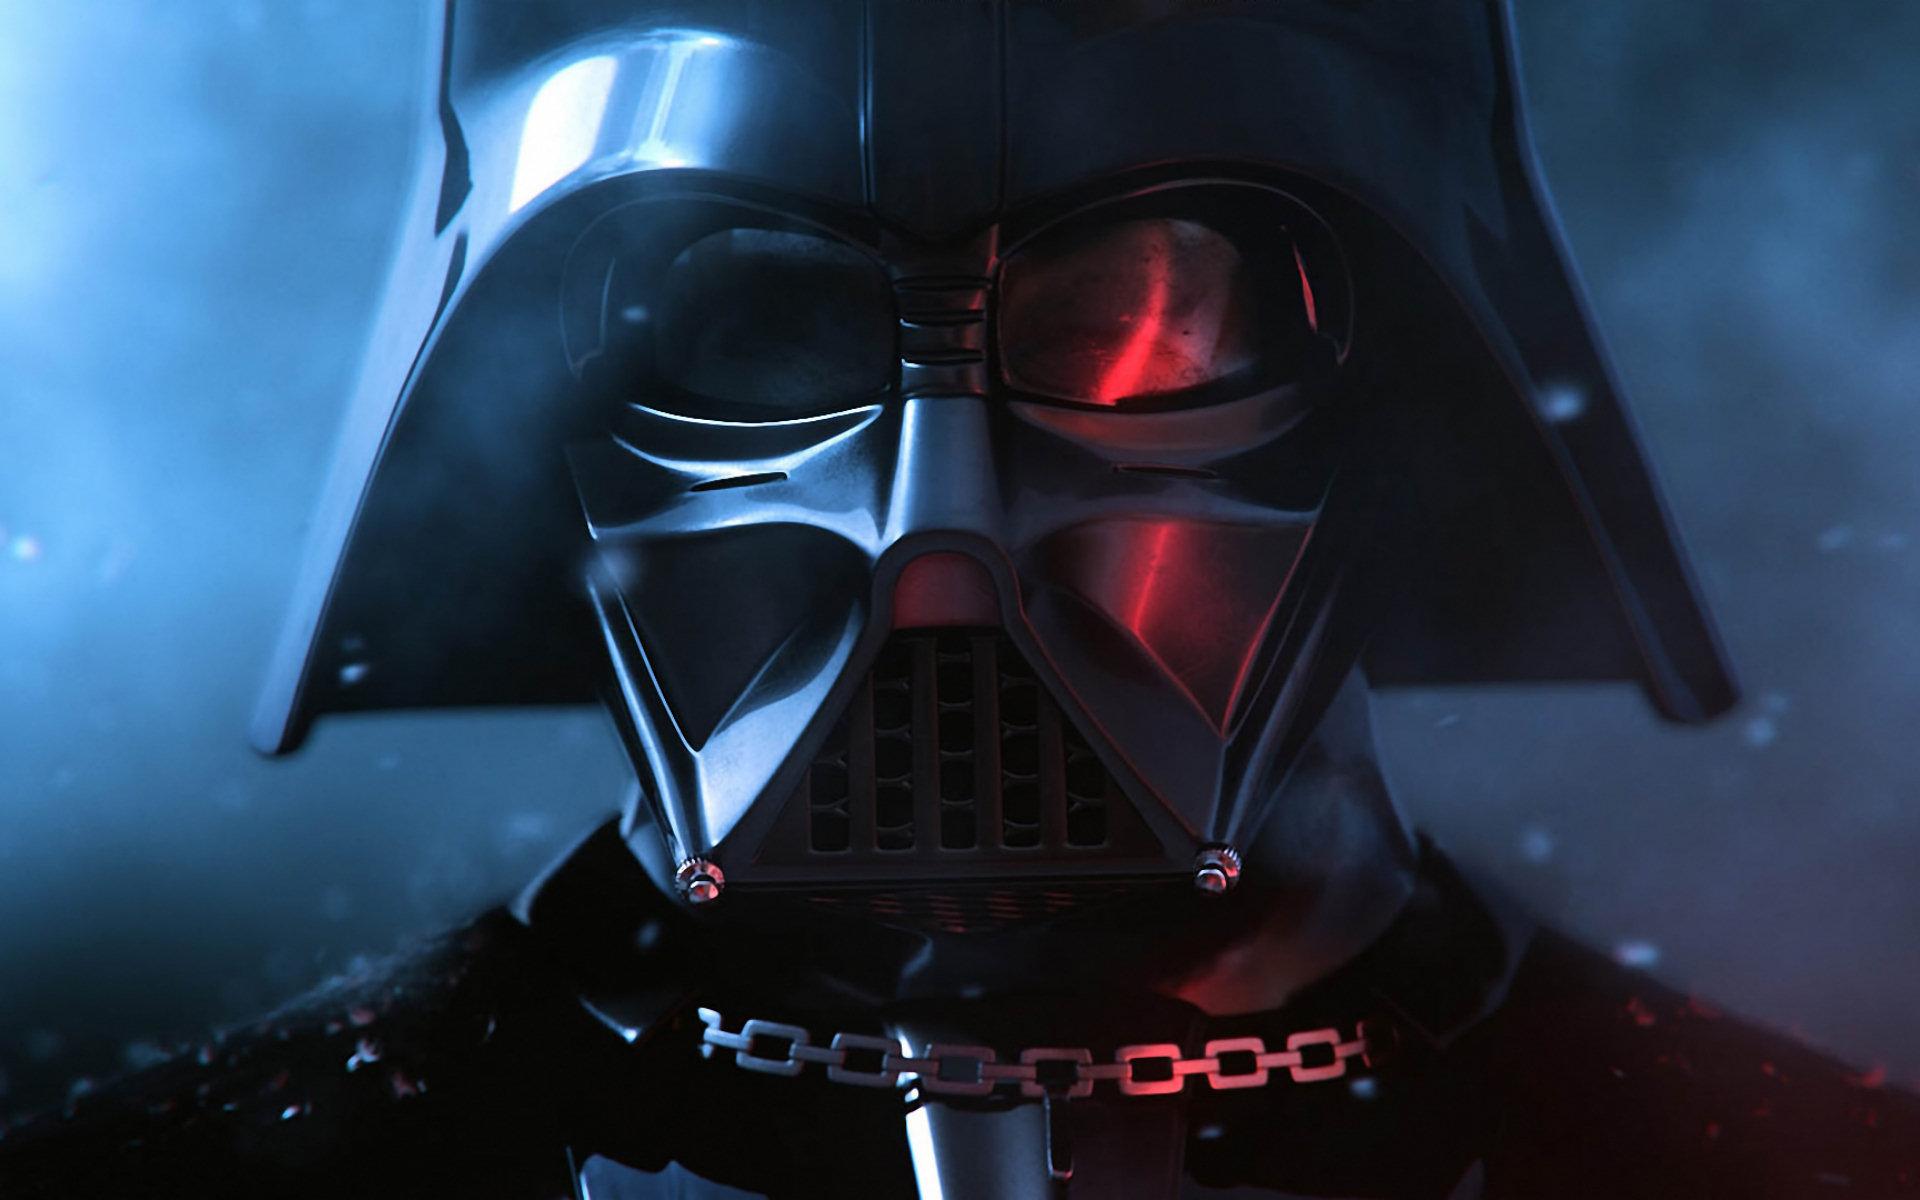 Darth Vader Hd Wallpaper Background Image 1920x1200 Id 270241